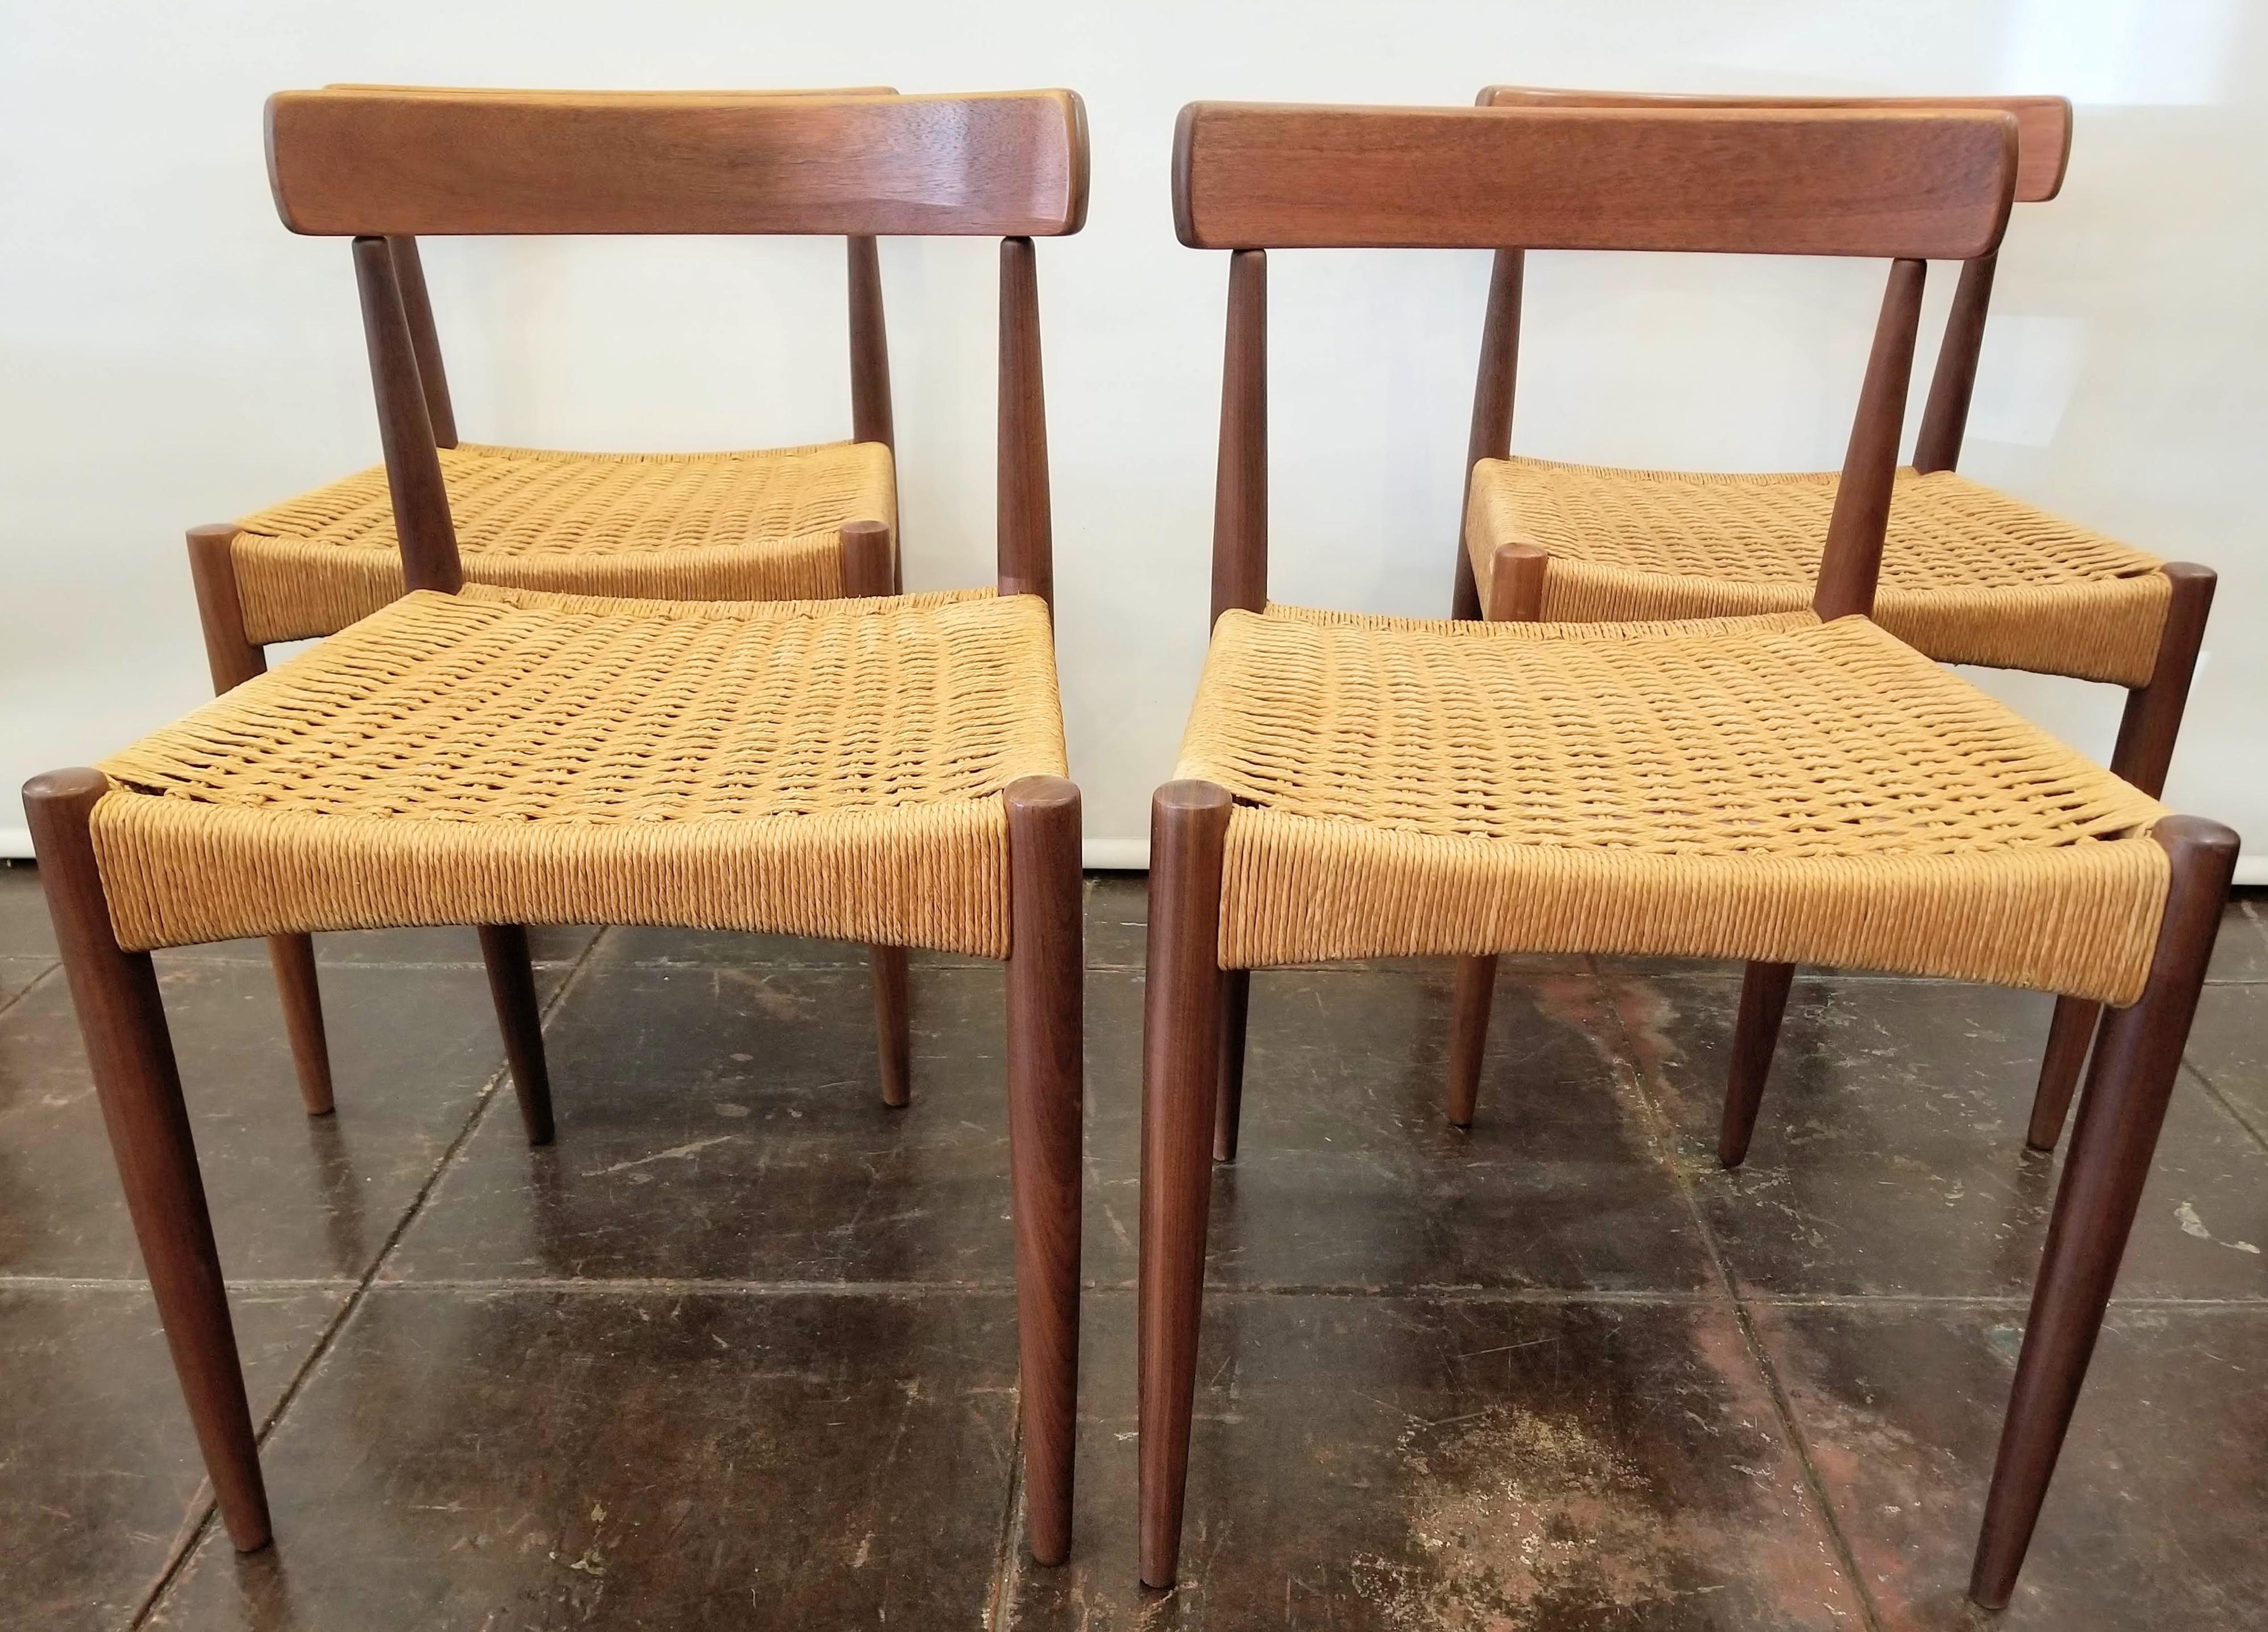 danish design dining chairs furniture 1950s vintage arne hovmand olsen for mogens kold danish modern dining chairs set of